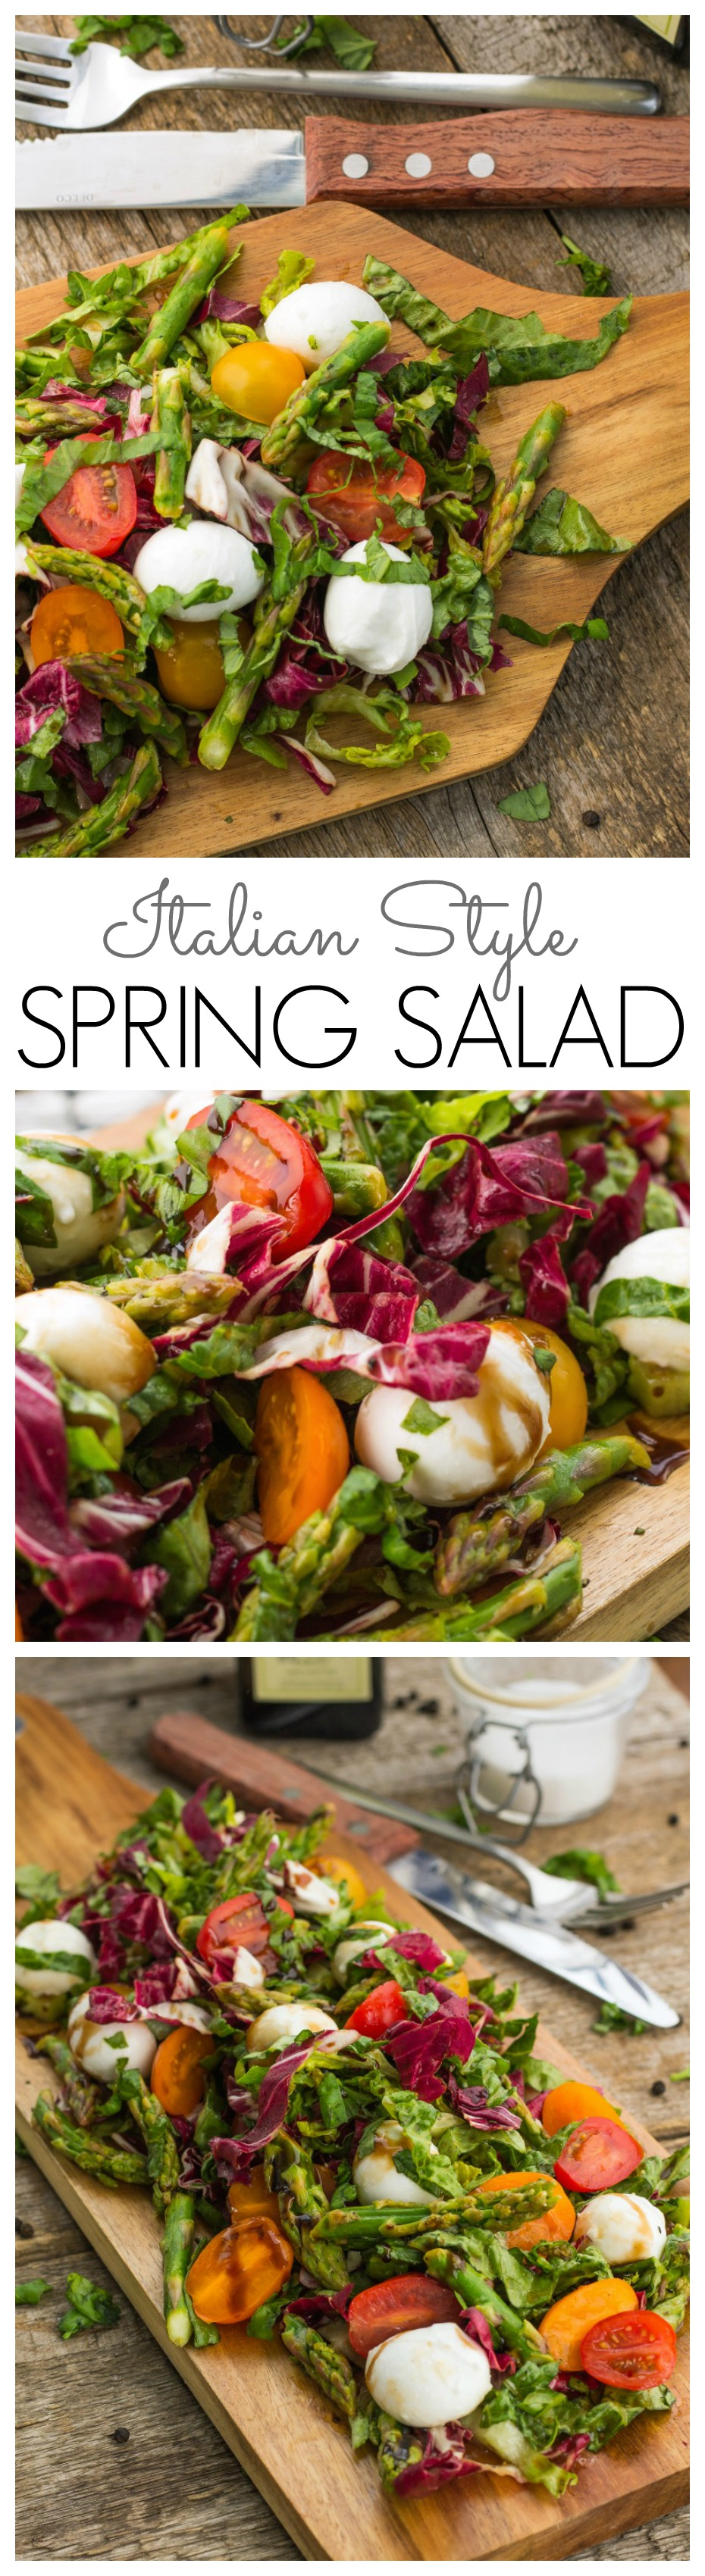 Italian style spring salad